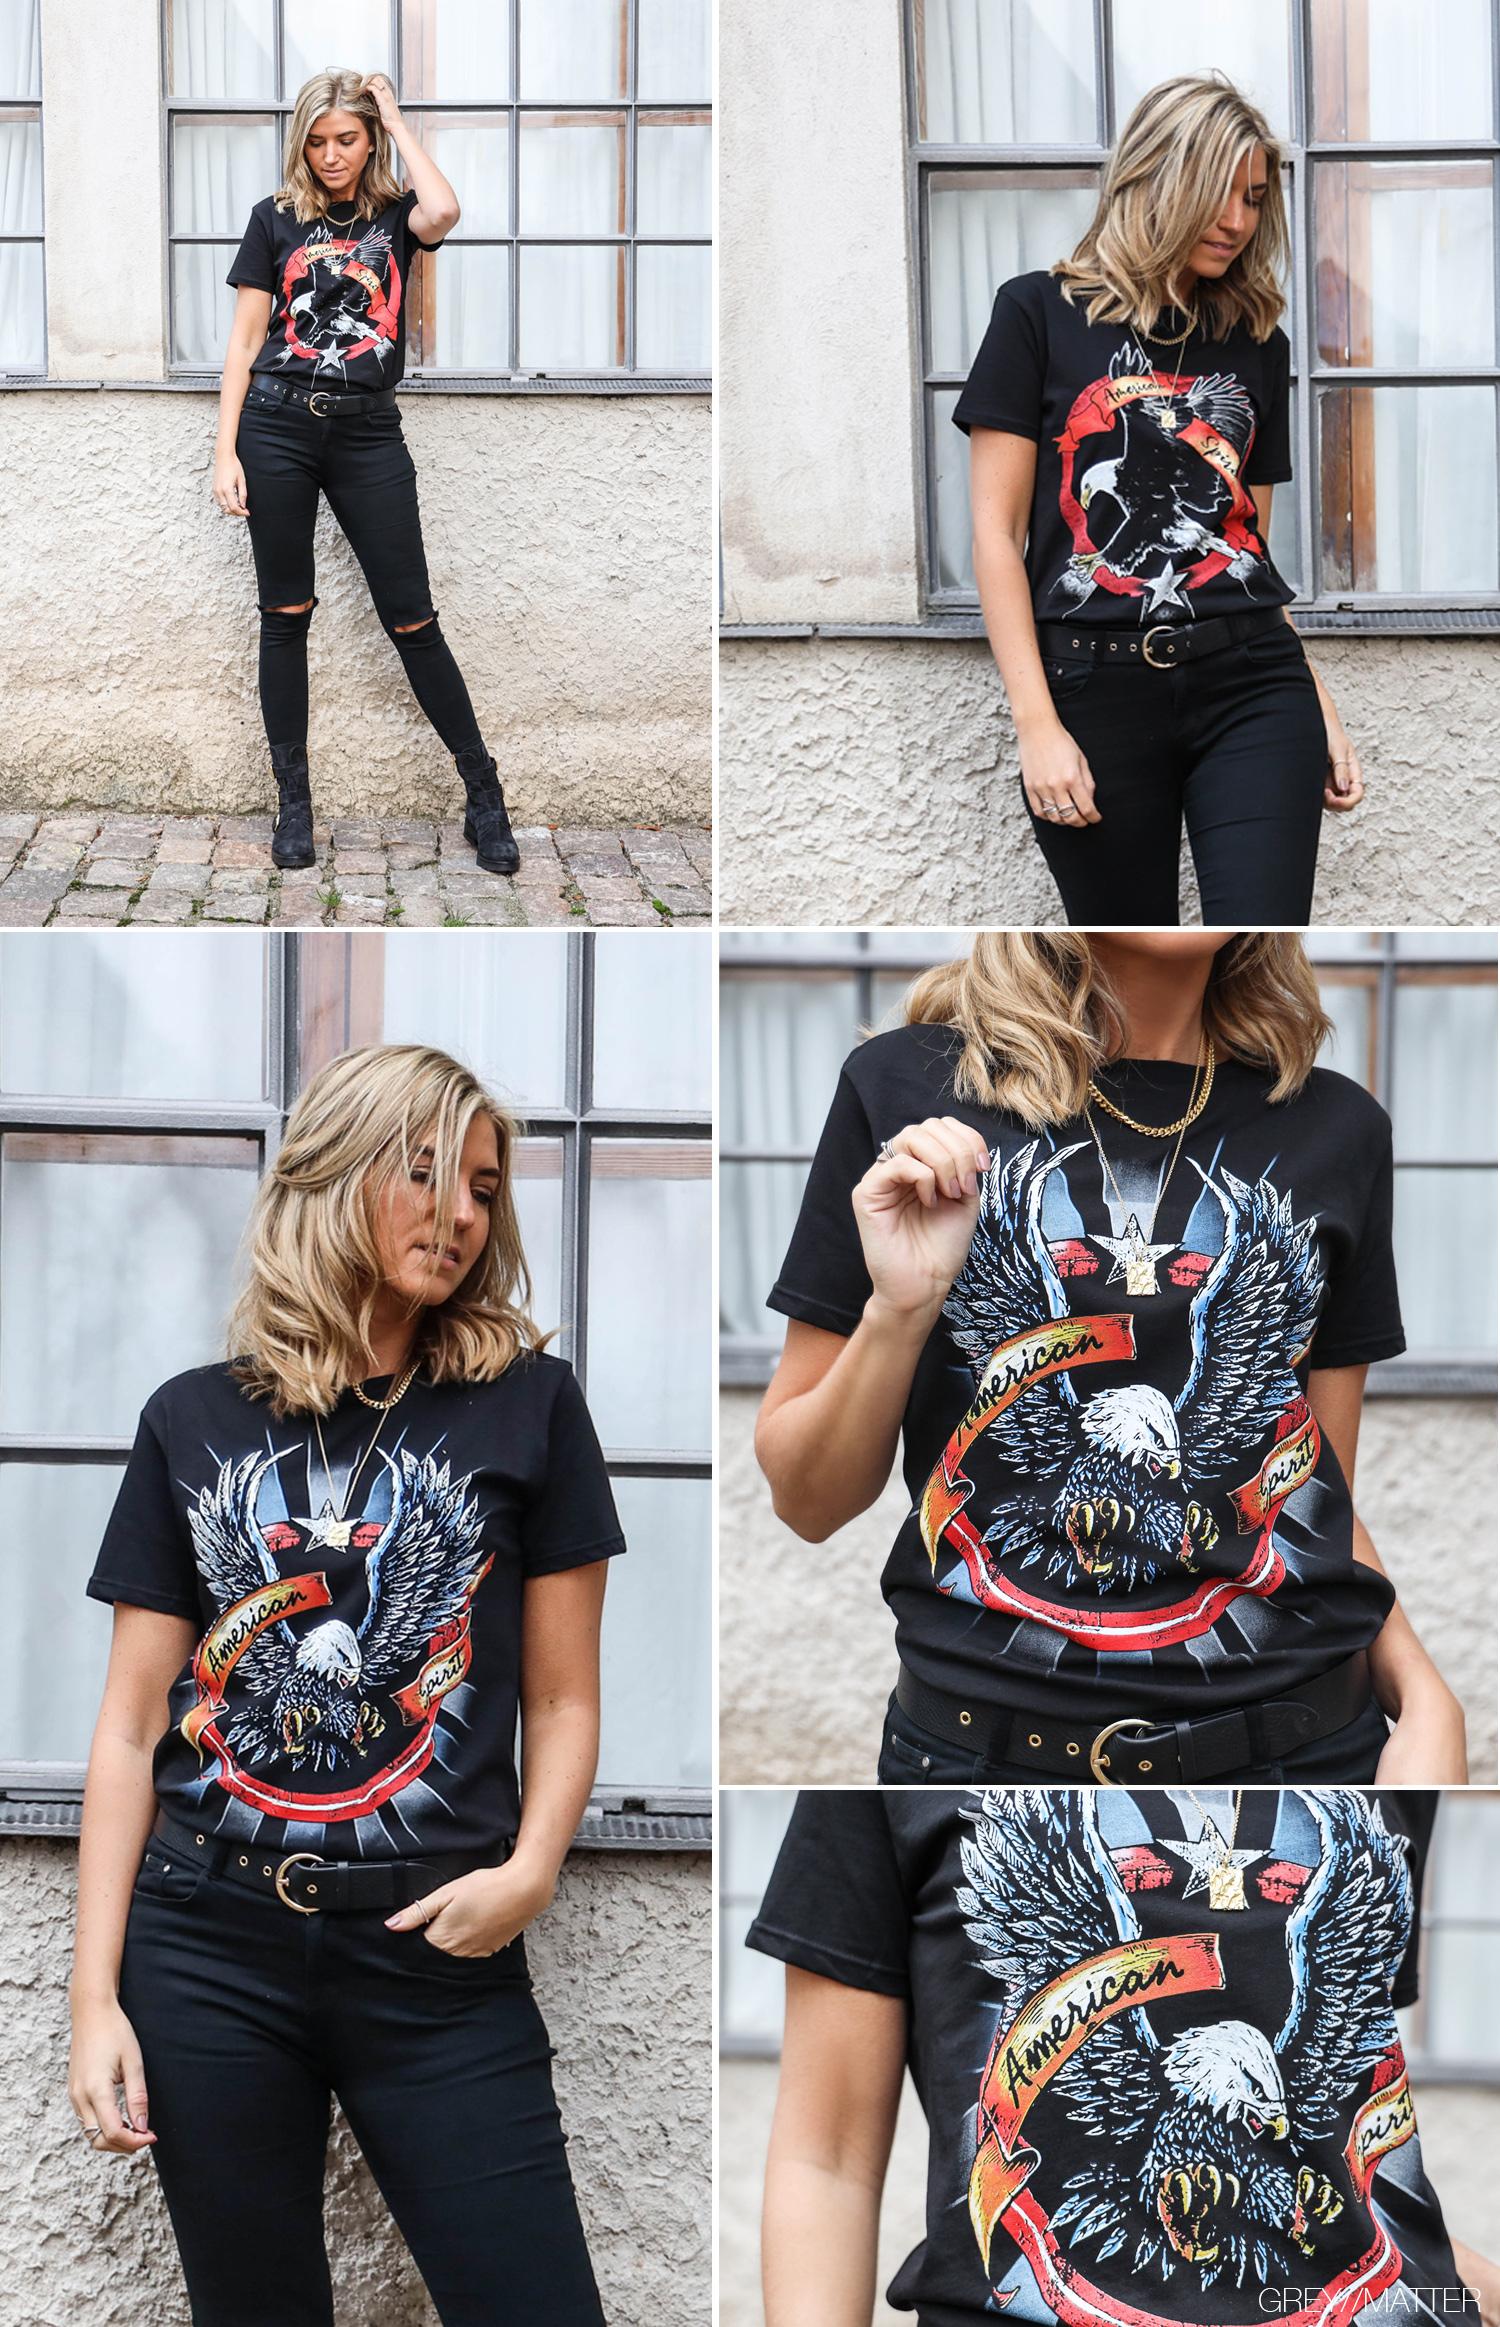 greymatter-fashion-eagle-t-shirts-gm.jpg